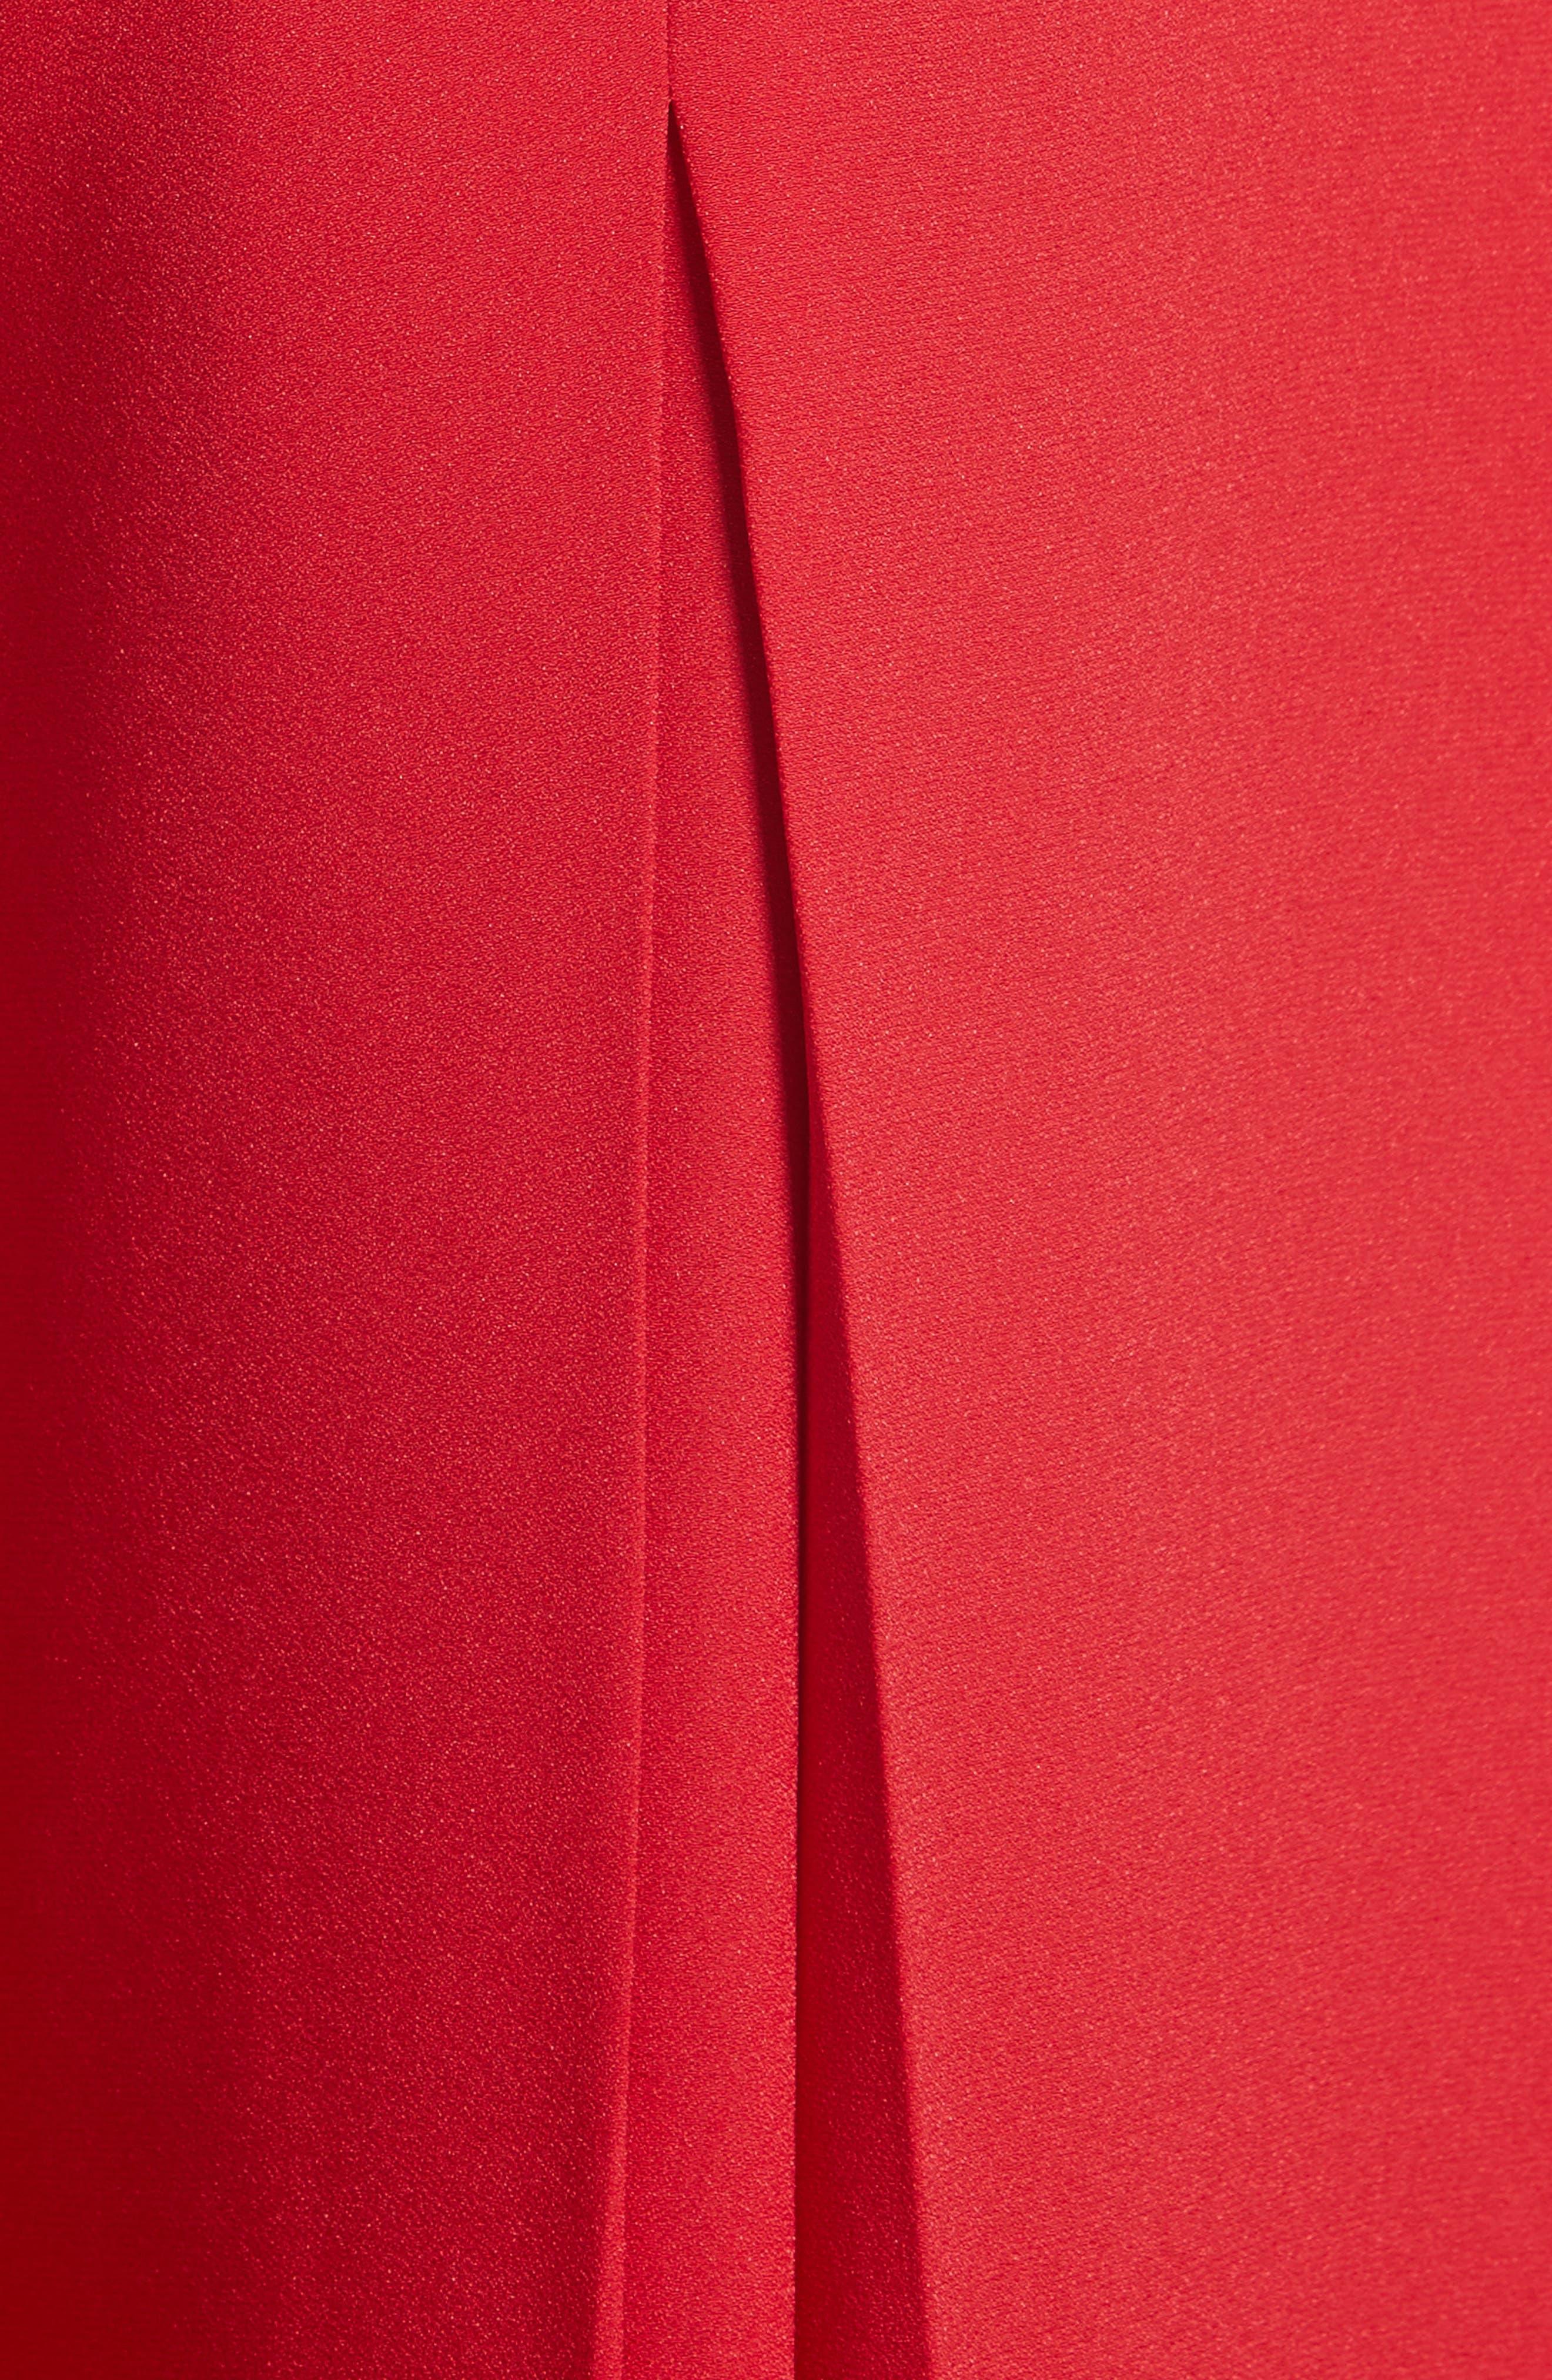 Crepe Cady Wide Leg Pants,                             Alternate thumbnail 7, color,                             Red